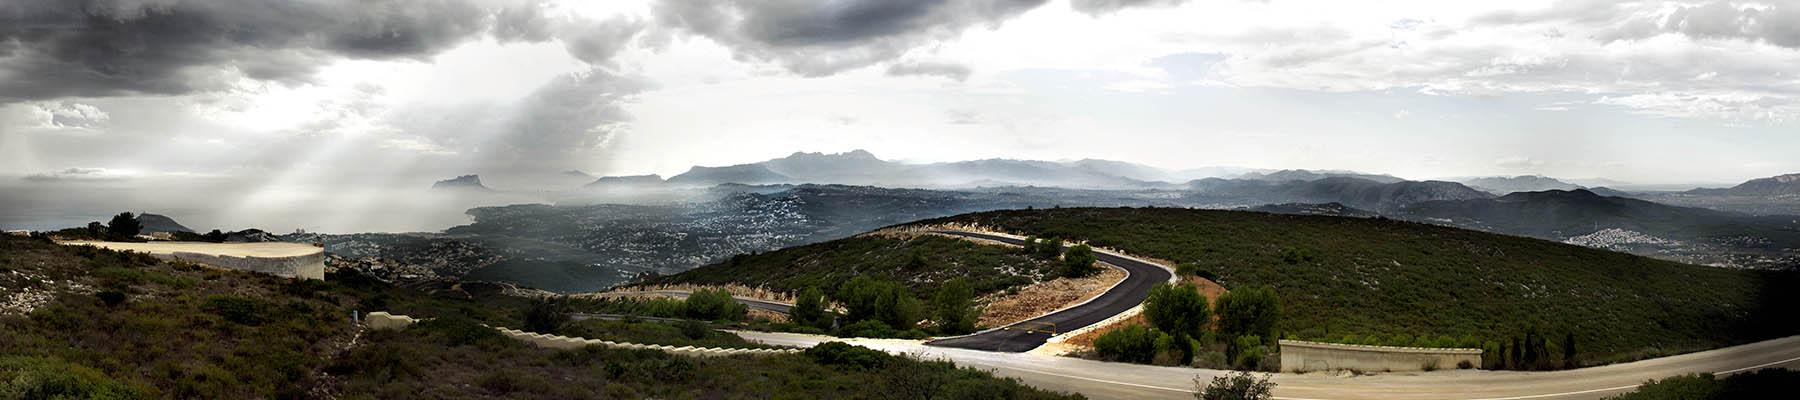 RubenChesa-panoramicaCumbre1800x400paraweb